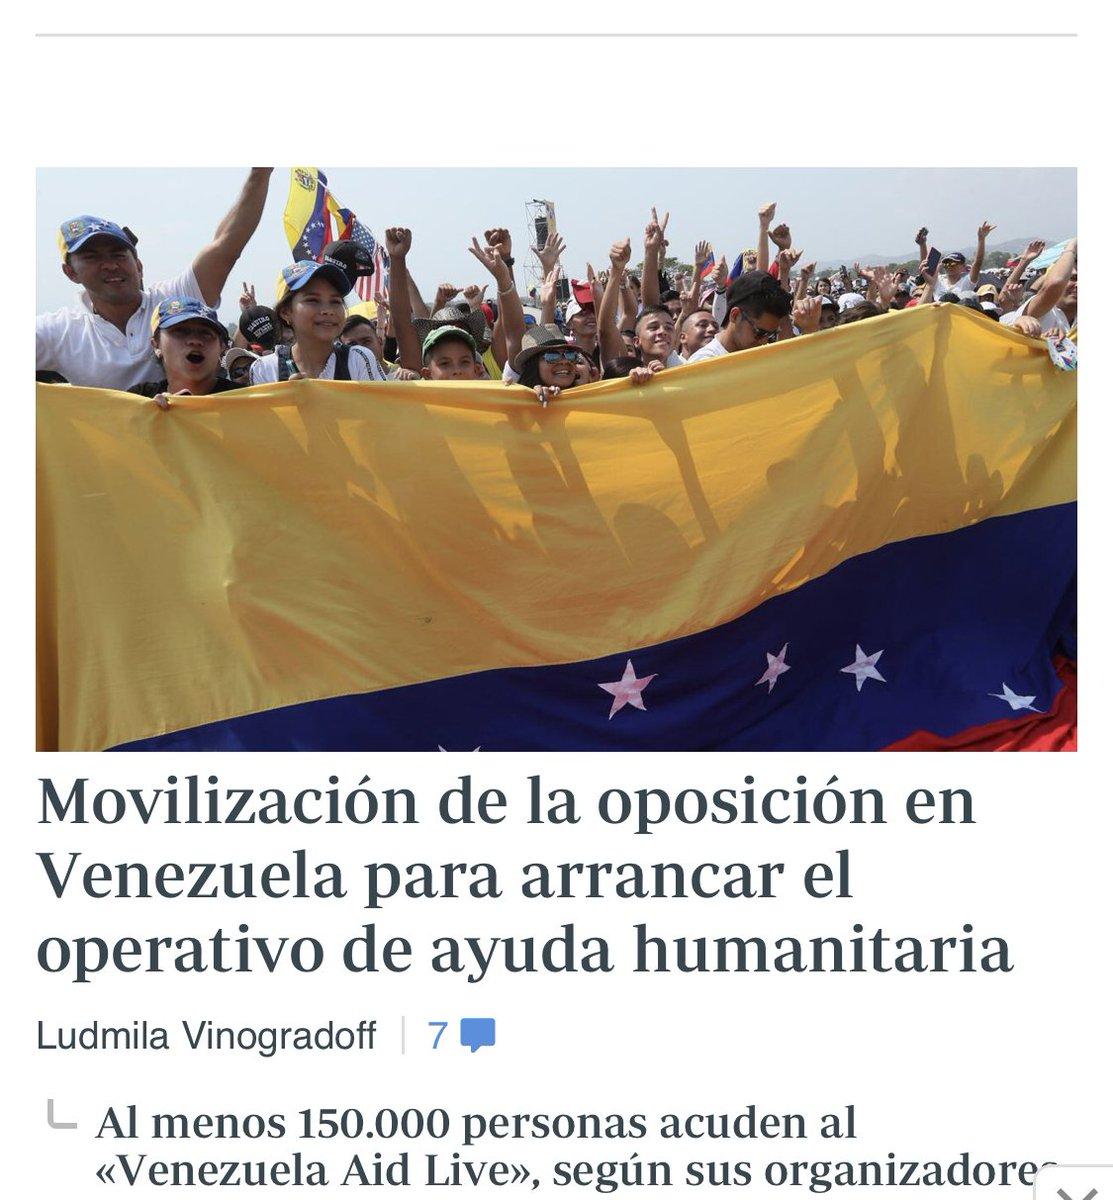 ¡Viva Venezuela libre!